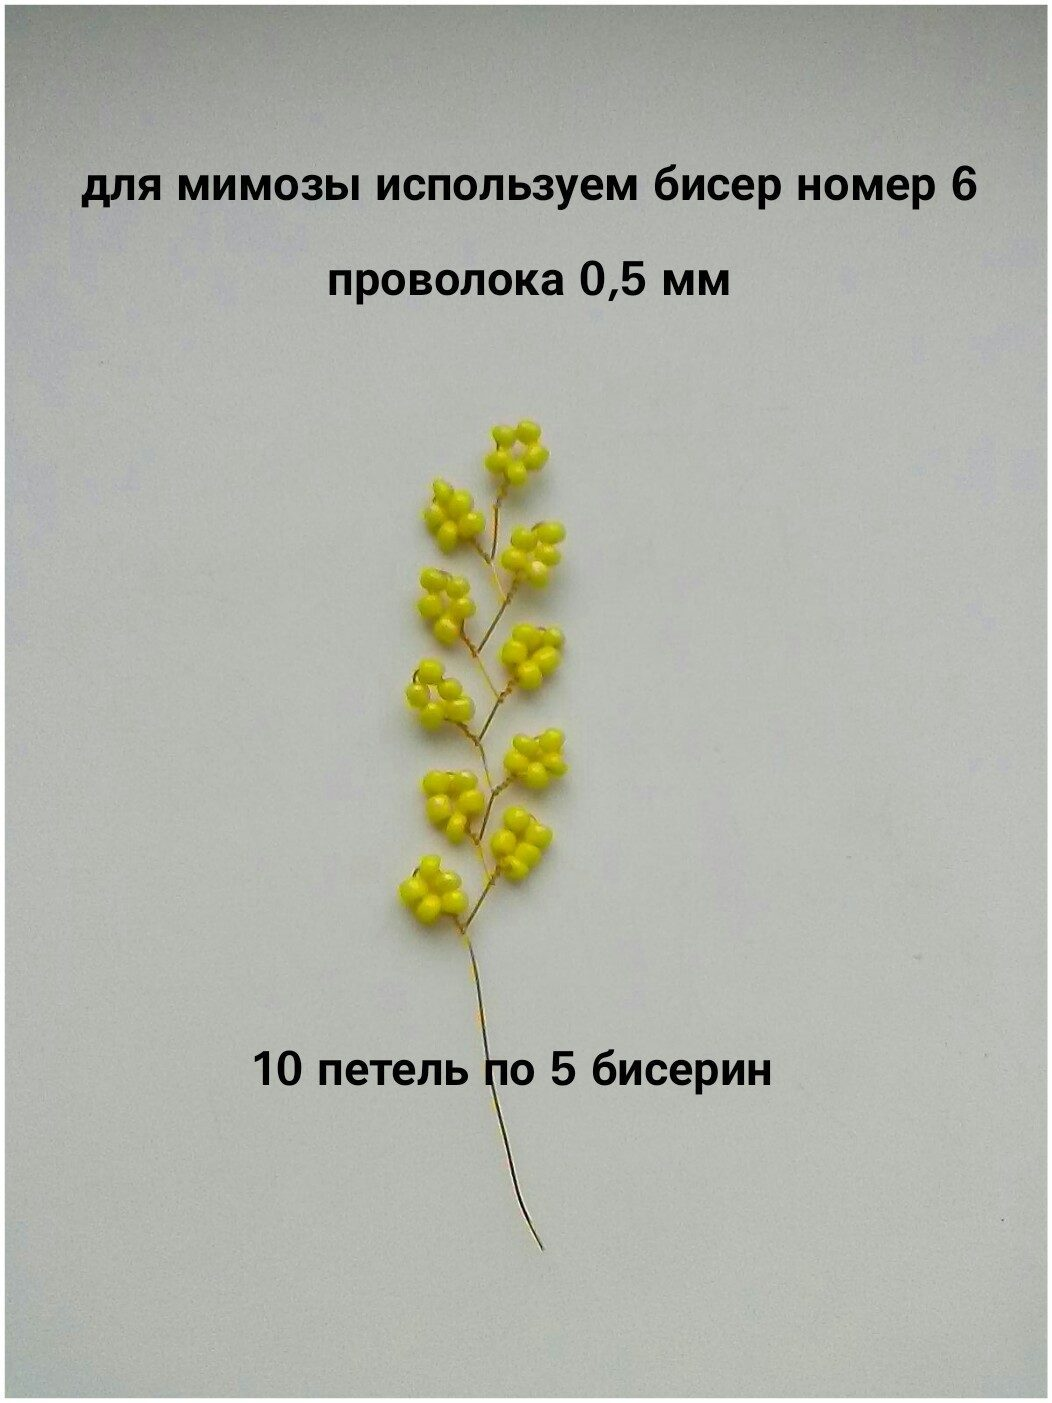 Композиции Image?id=862330454938&t=3&plc=WEB&tkn=*whg0_MRK9Q6ln5Eir5pEzGyaAeI